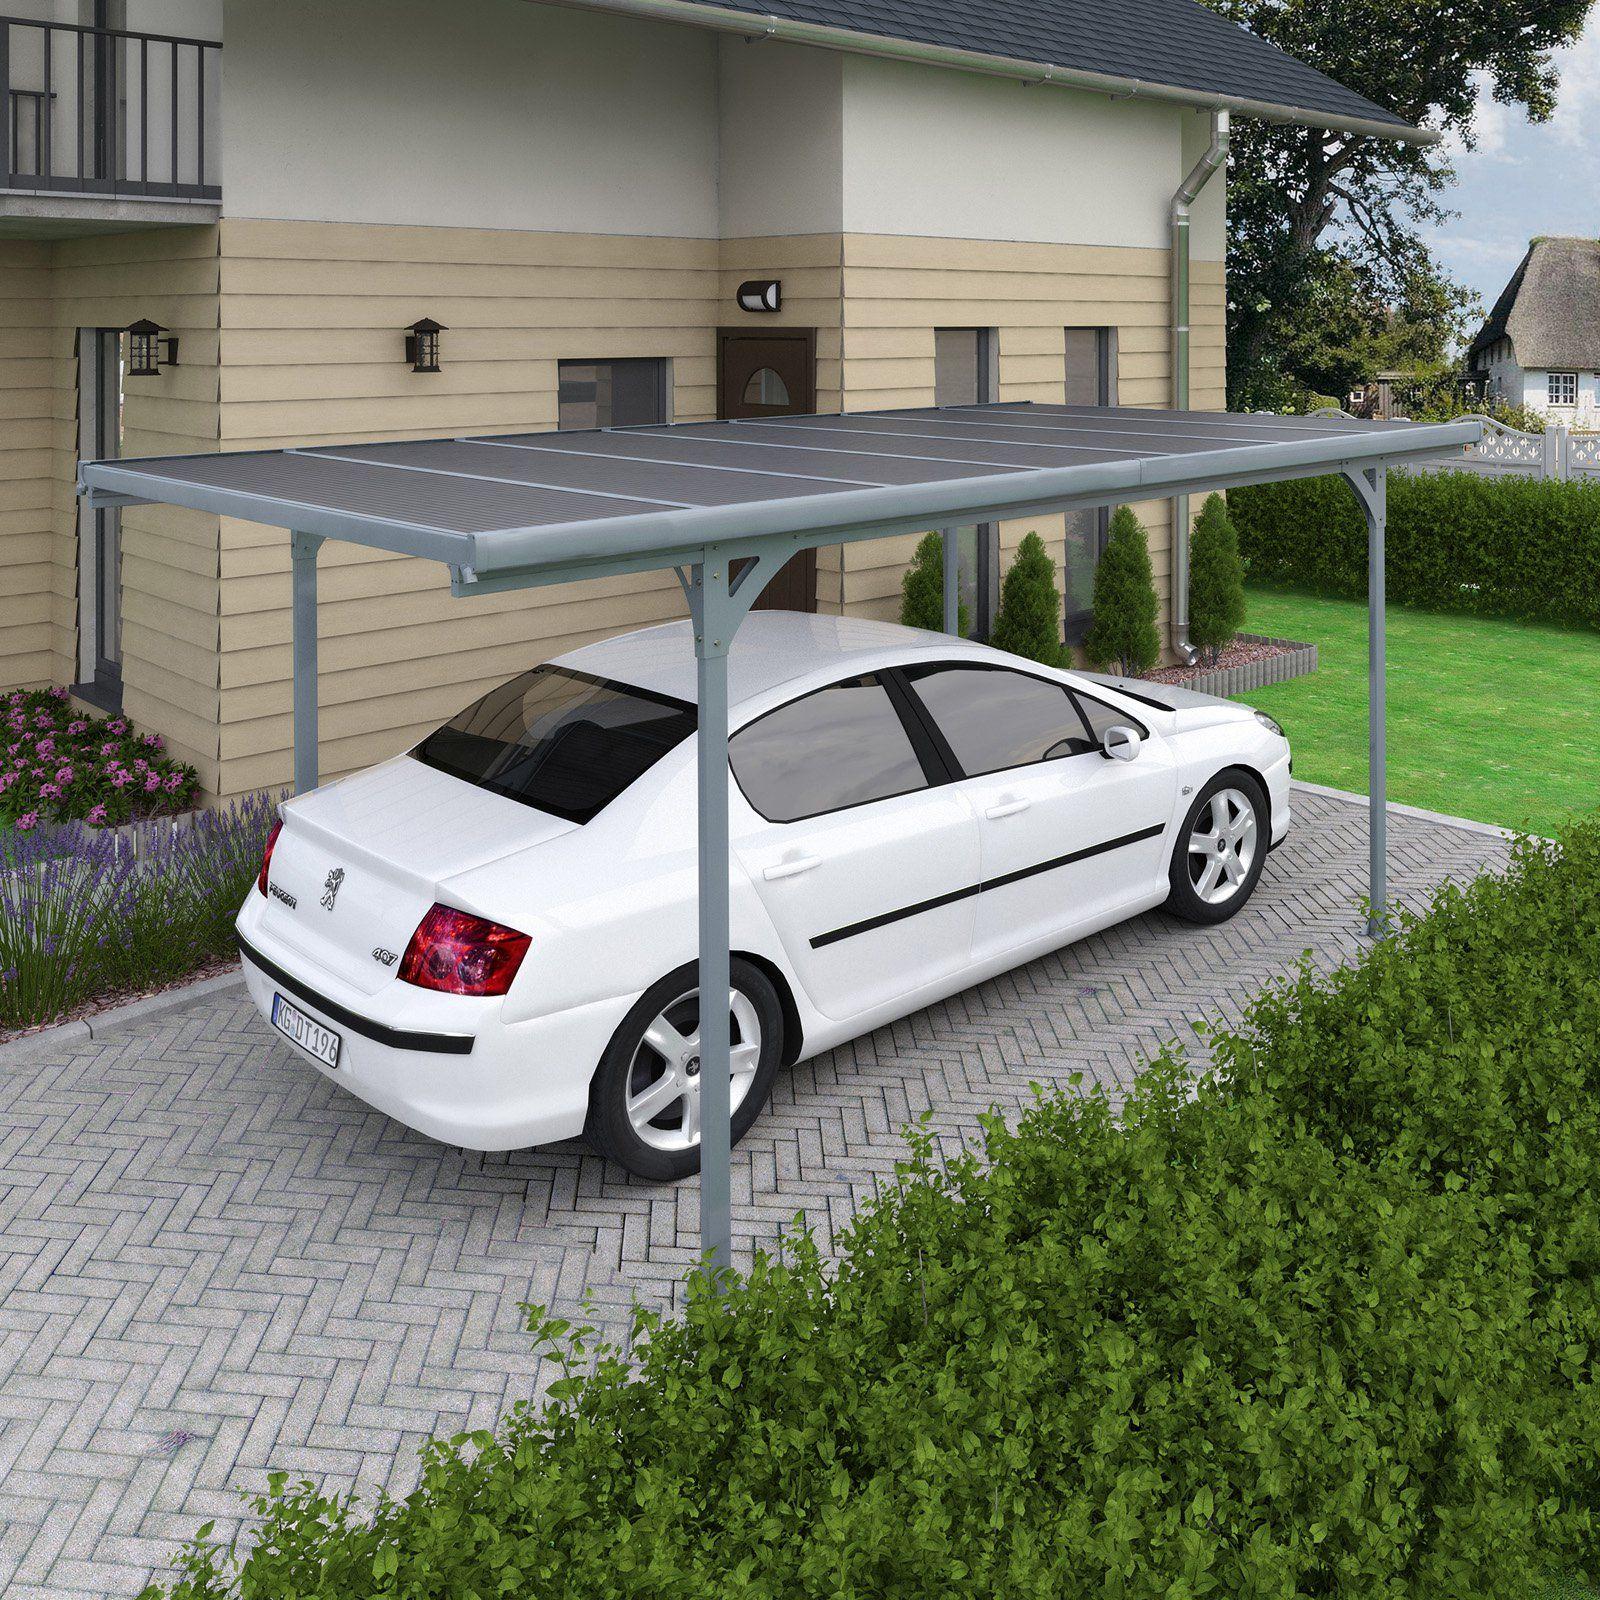 Palram Verona 9 76 X 16 41 Ft Carport Contractors Would Have